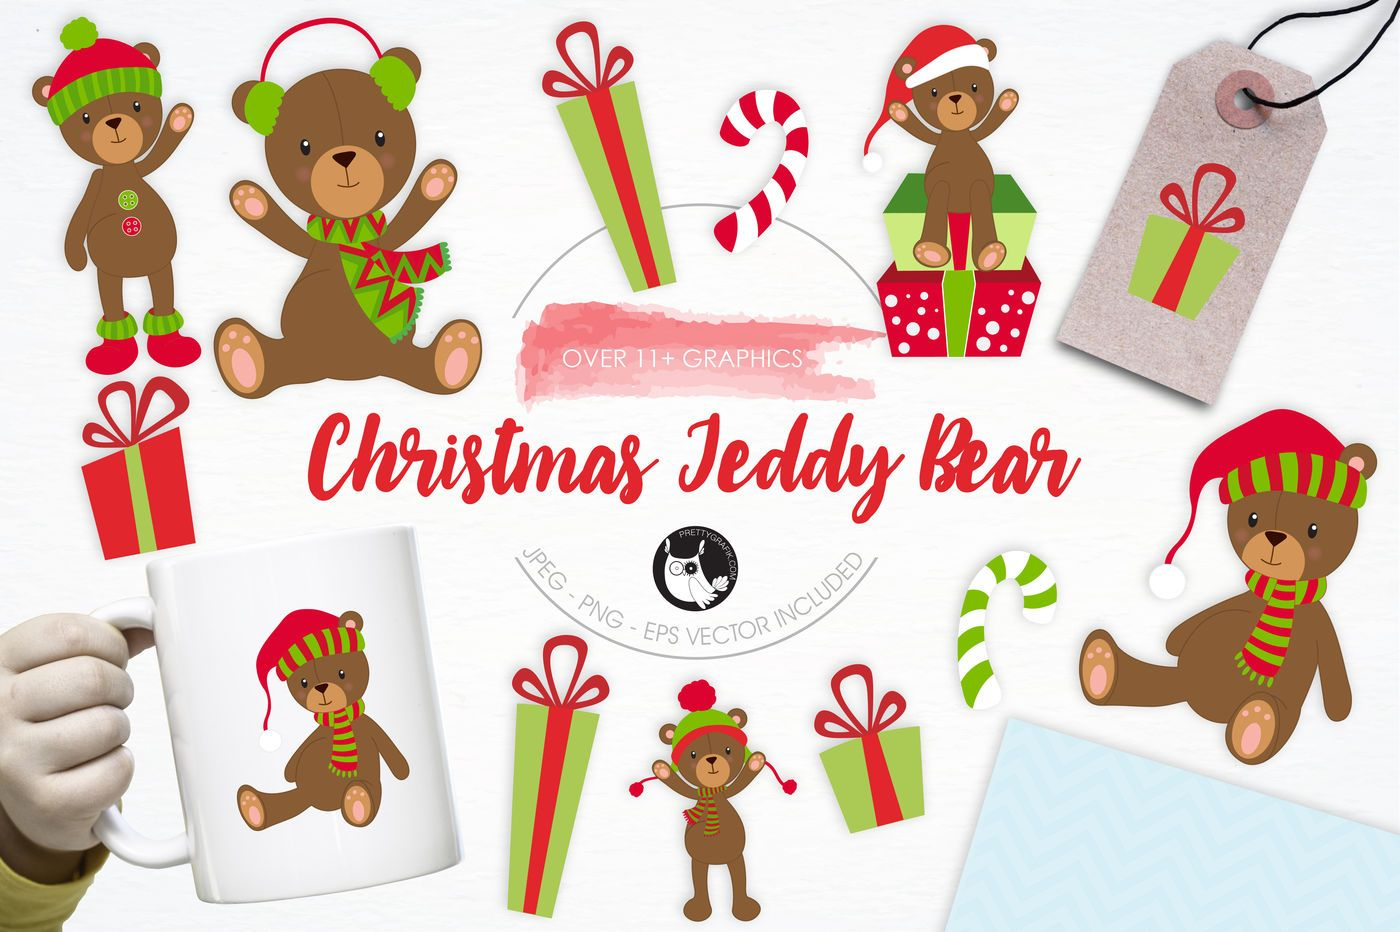 Christmas Teddy Bear Graphics And Illustrations By Prettygrafik Design Thehungryjpeg Com Bear Sponsored Christmas Teddy Bear Christmas Bear Bear Graphic